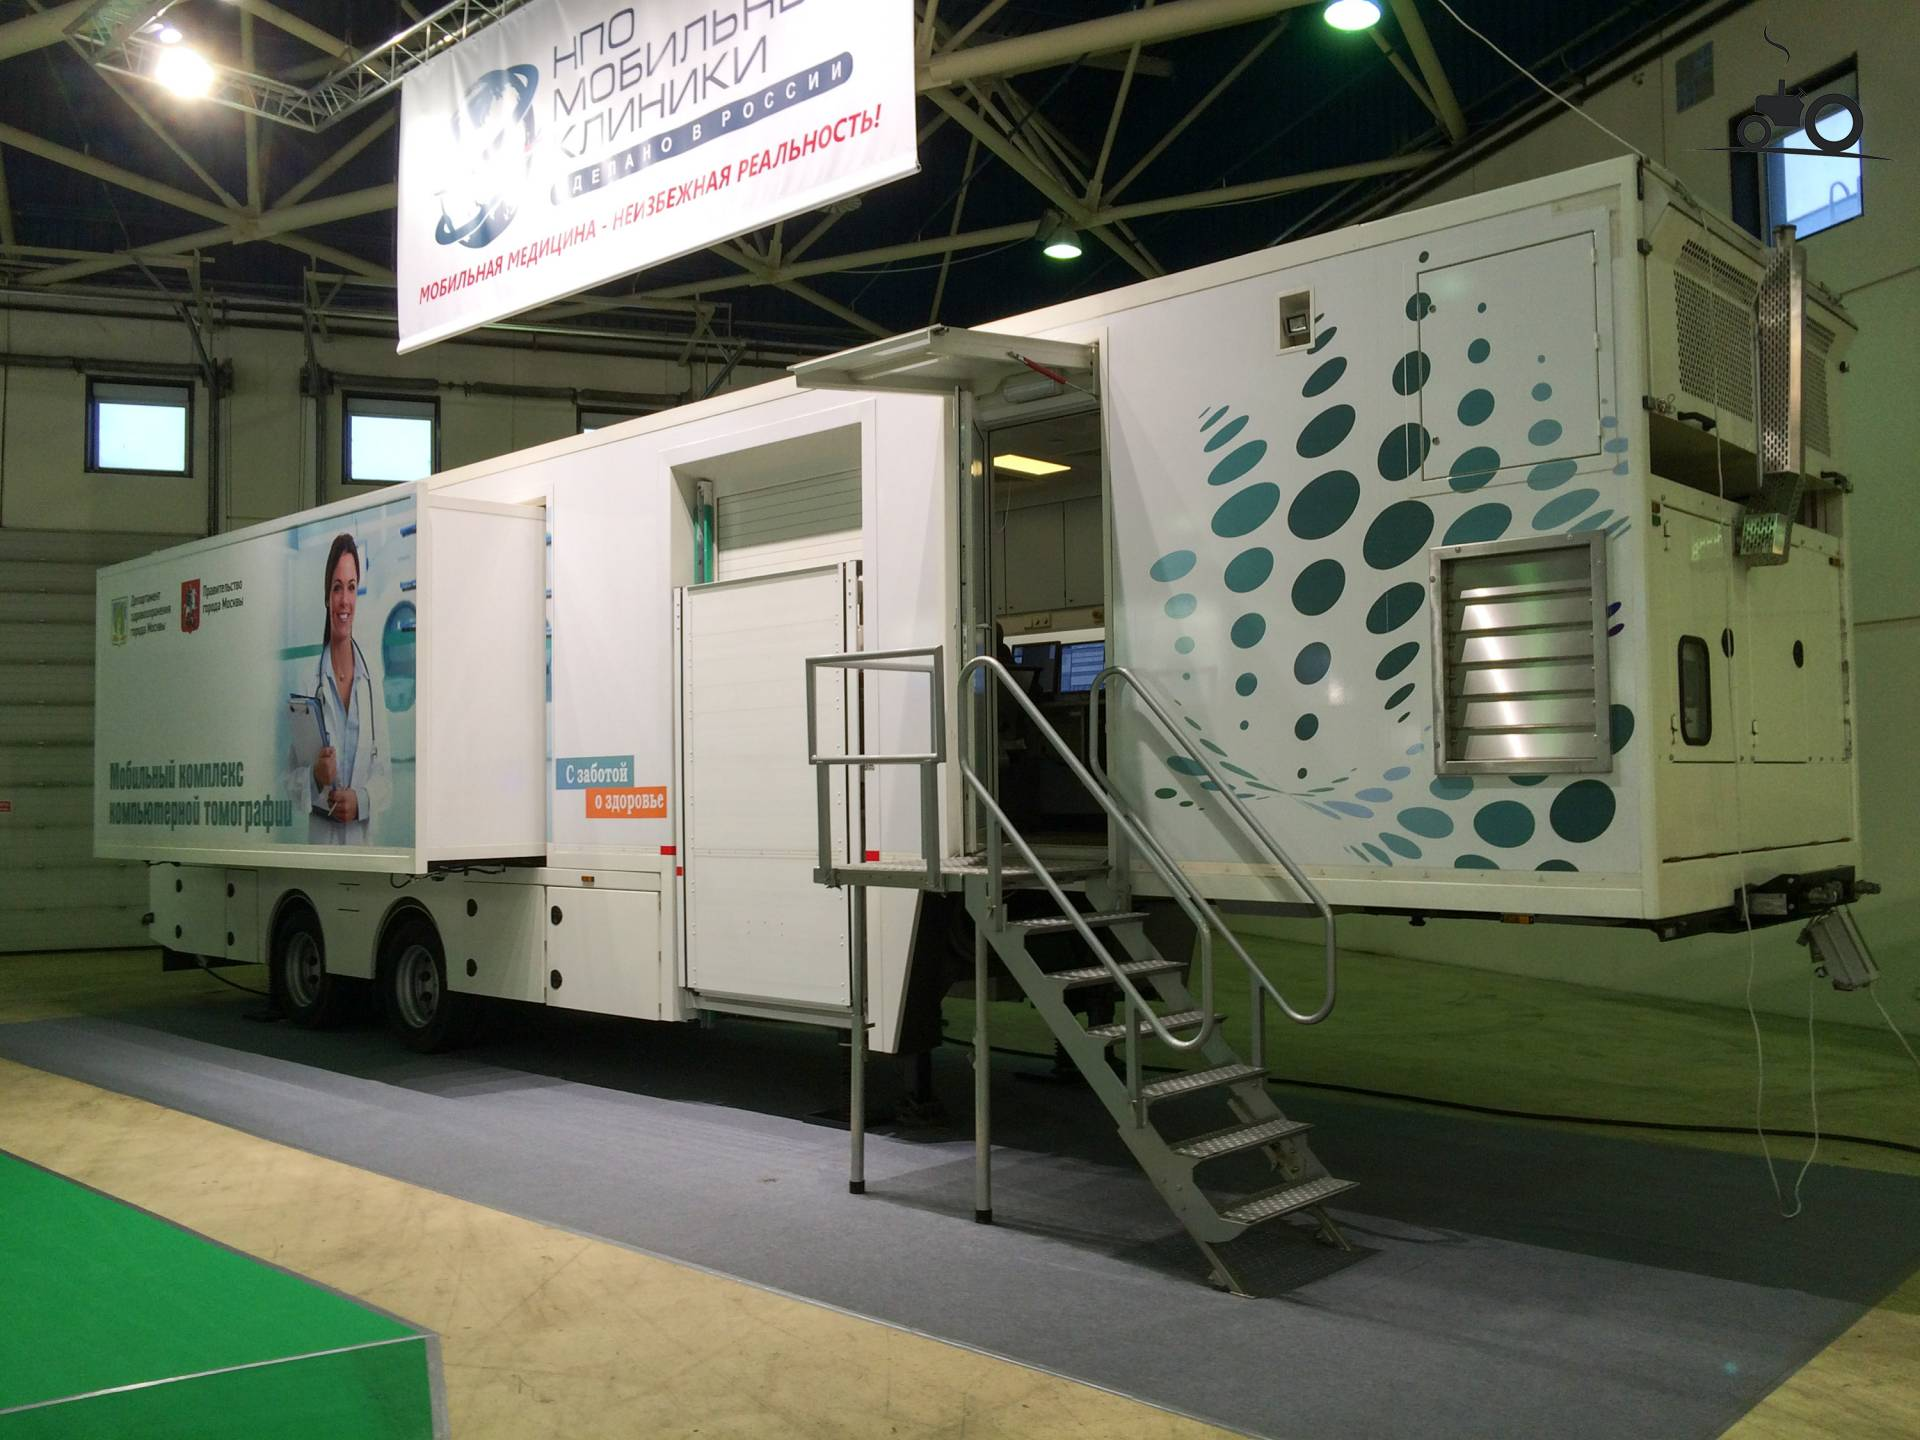 Medi-Clinic mobil CT